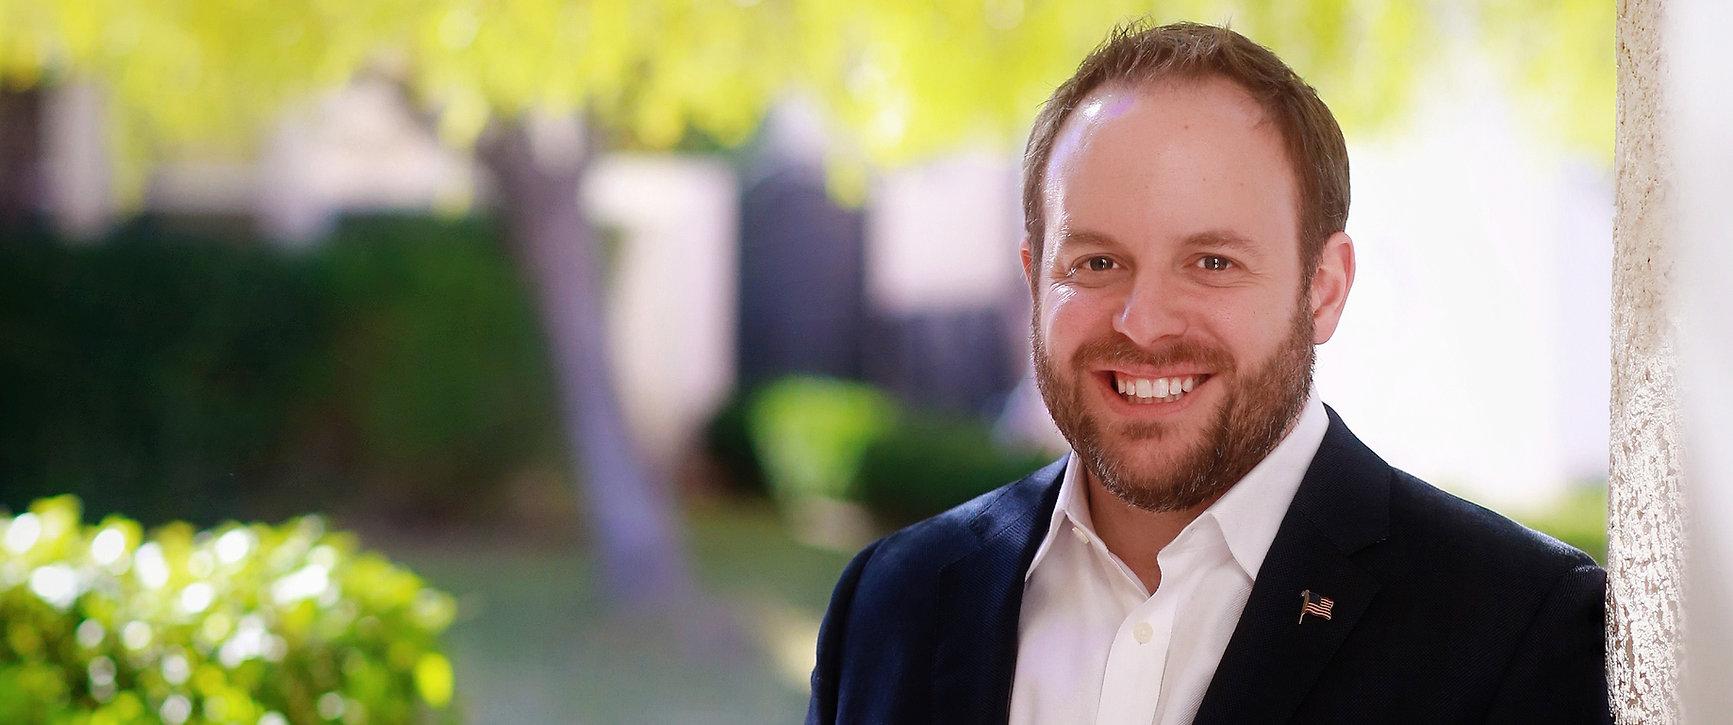 Zach Conine for NC Treasurer